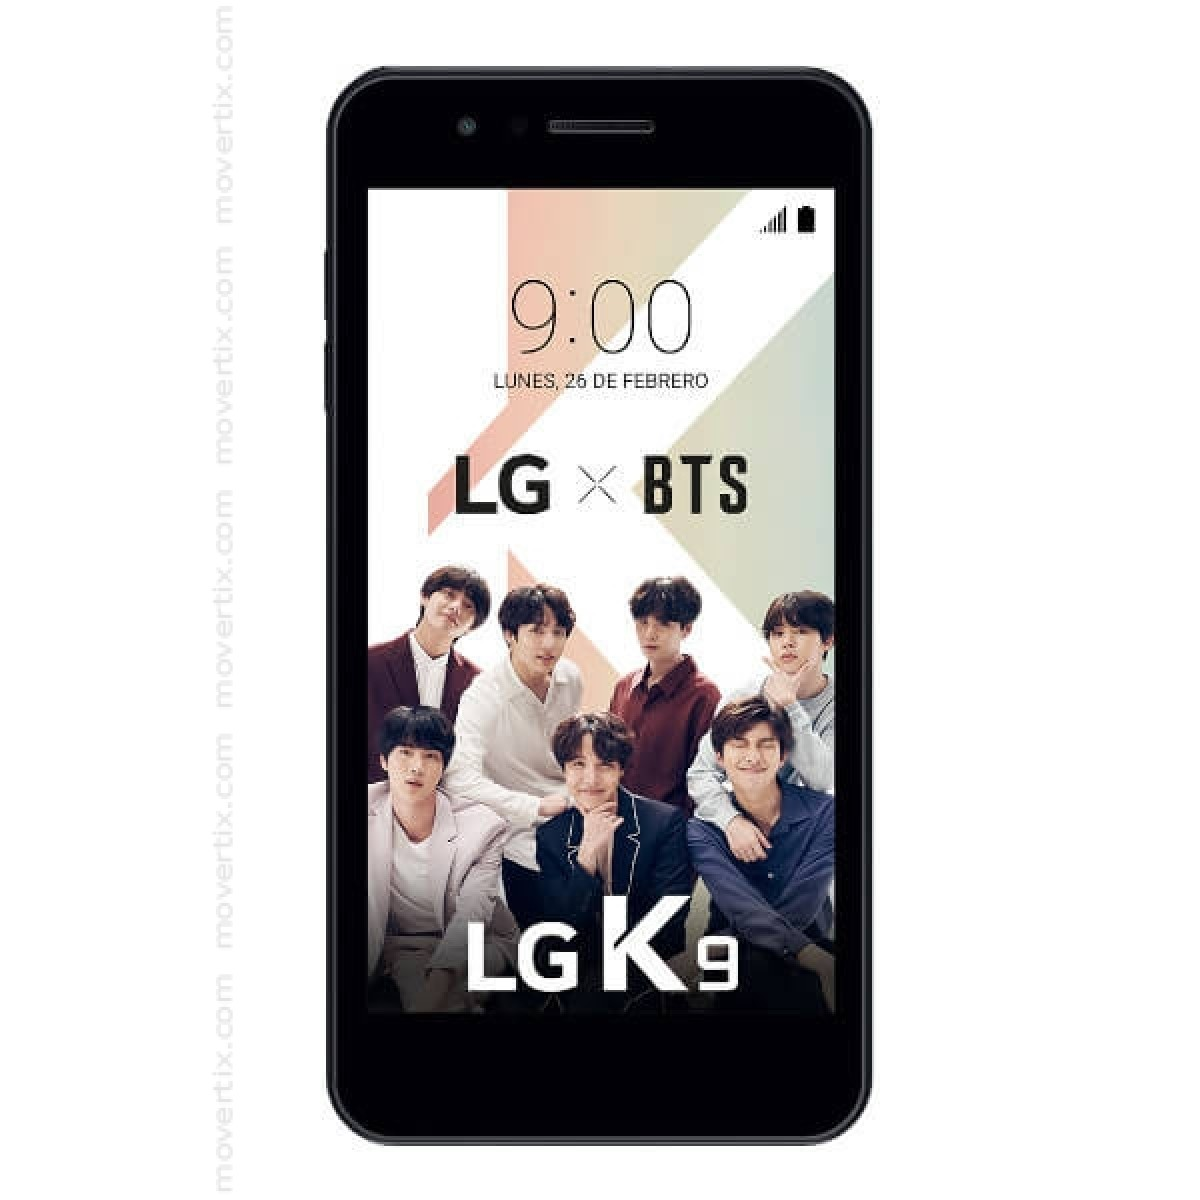 LG K9 Black 16GB and 2GB RAM (LM-X210)